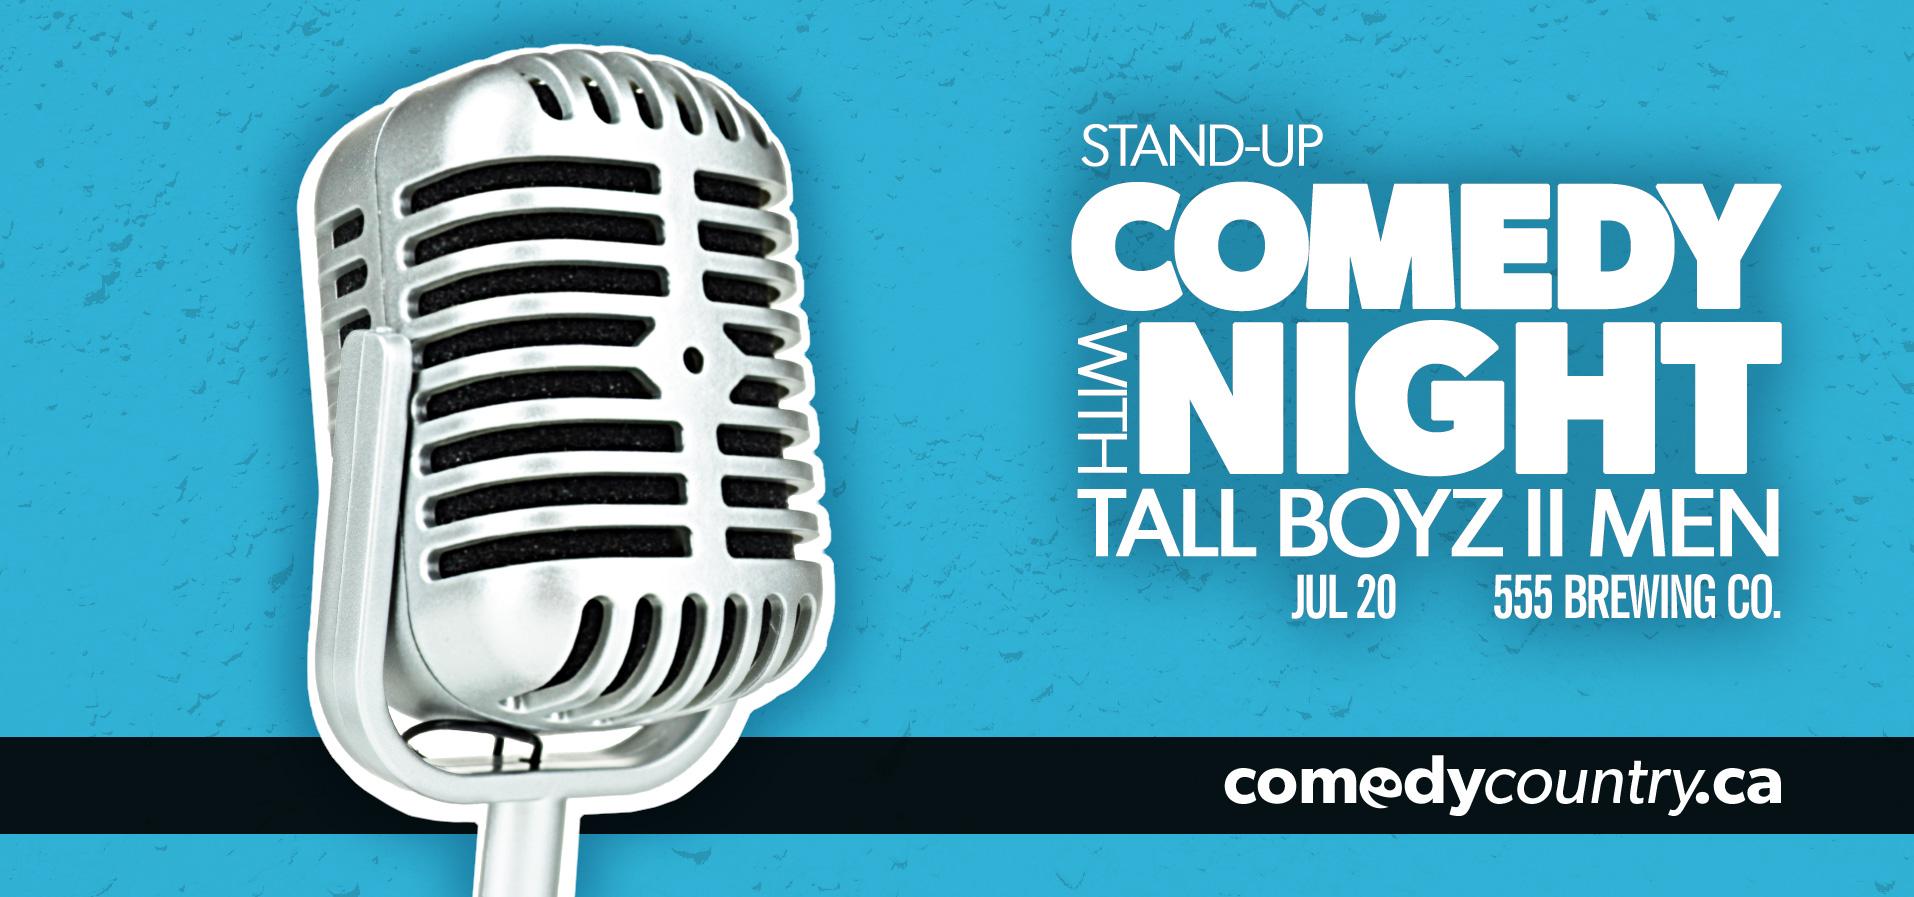 Stand-up Comedy Night w/ Tall Boyz II Men